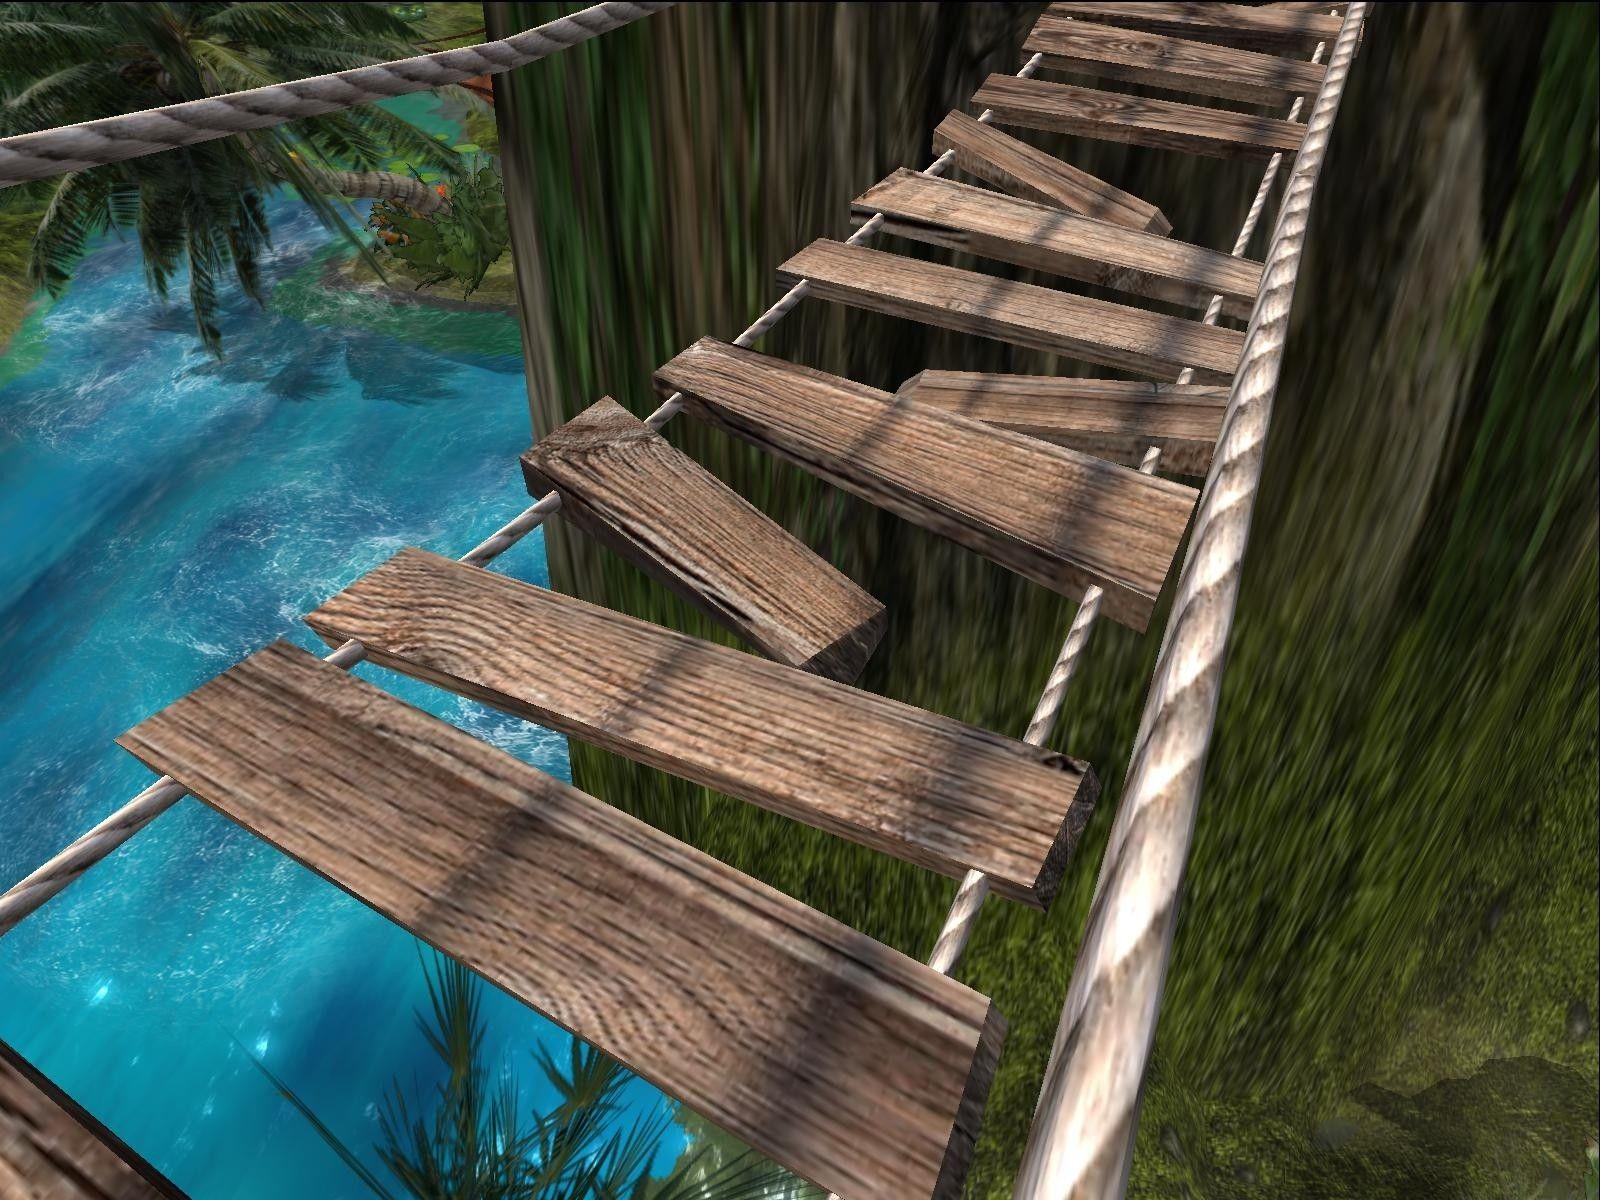 3D Hanging Rope Bridge - 3D Model | 3D-Modeling | Pinterest | Bridge